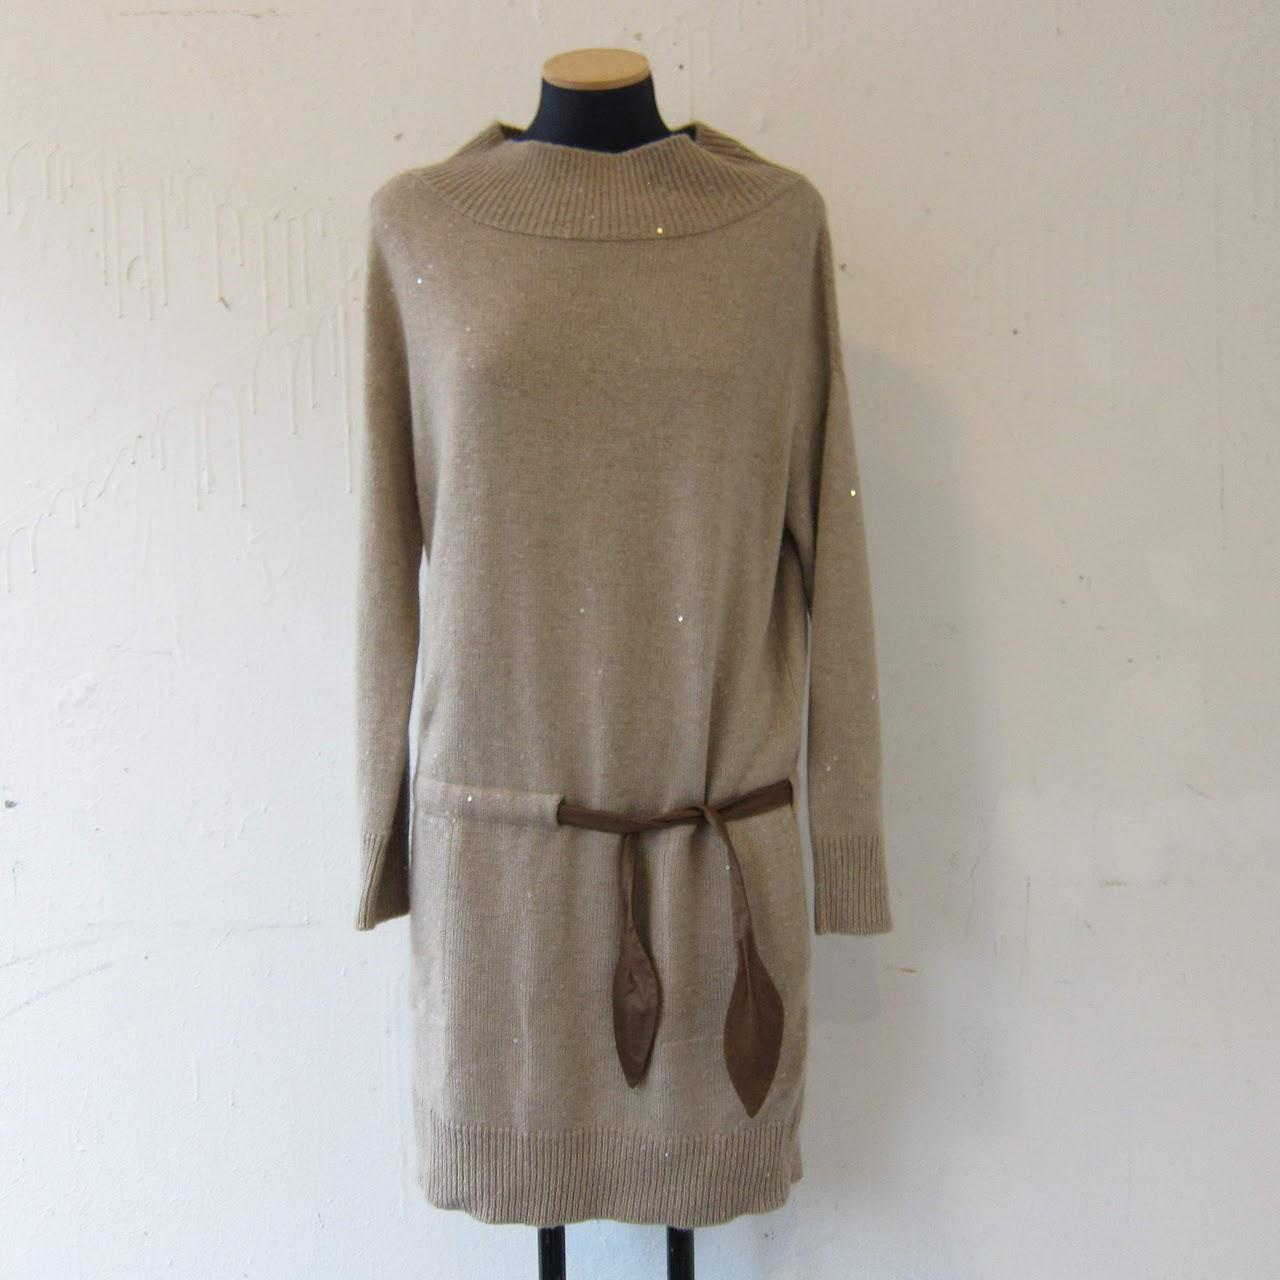 Brunello Cucinelli DressShophousingworks Cashmereamp; Silk Sweater Y6yv7gbIfm